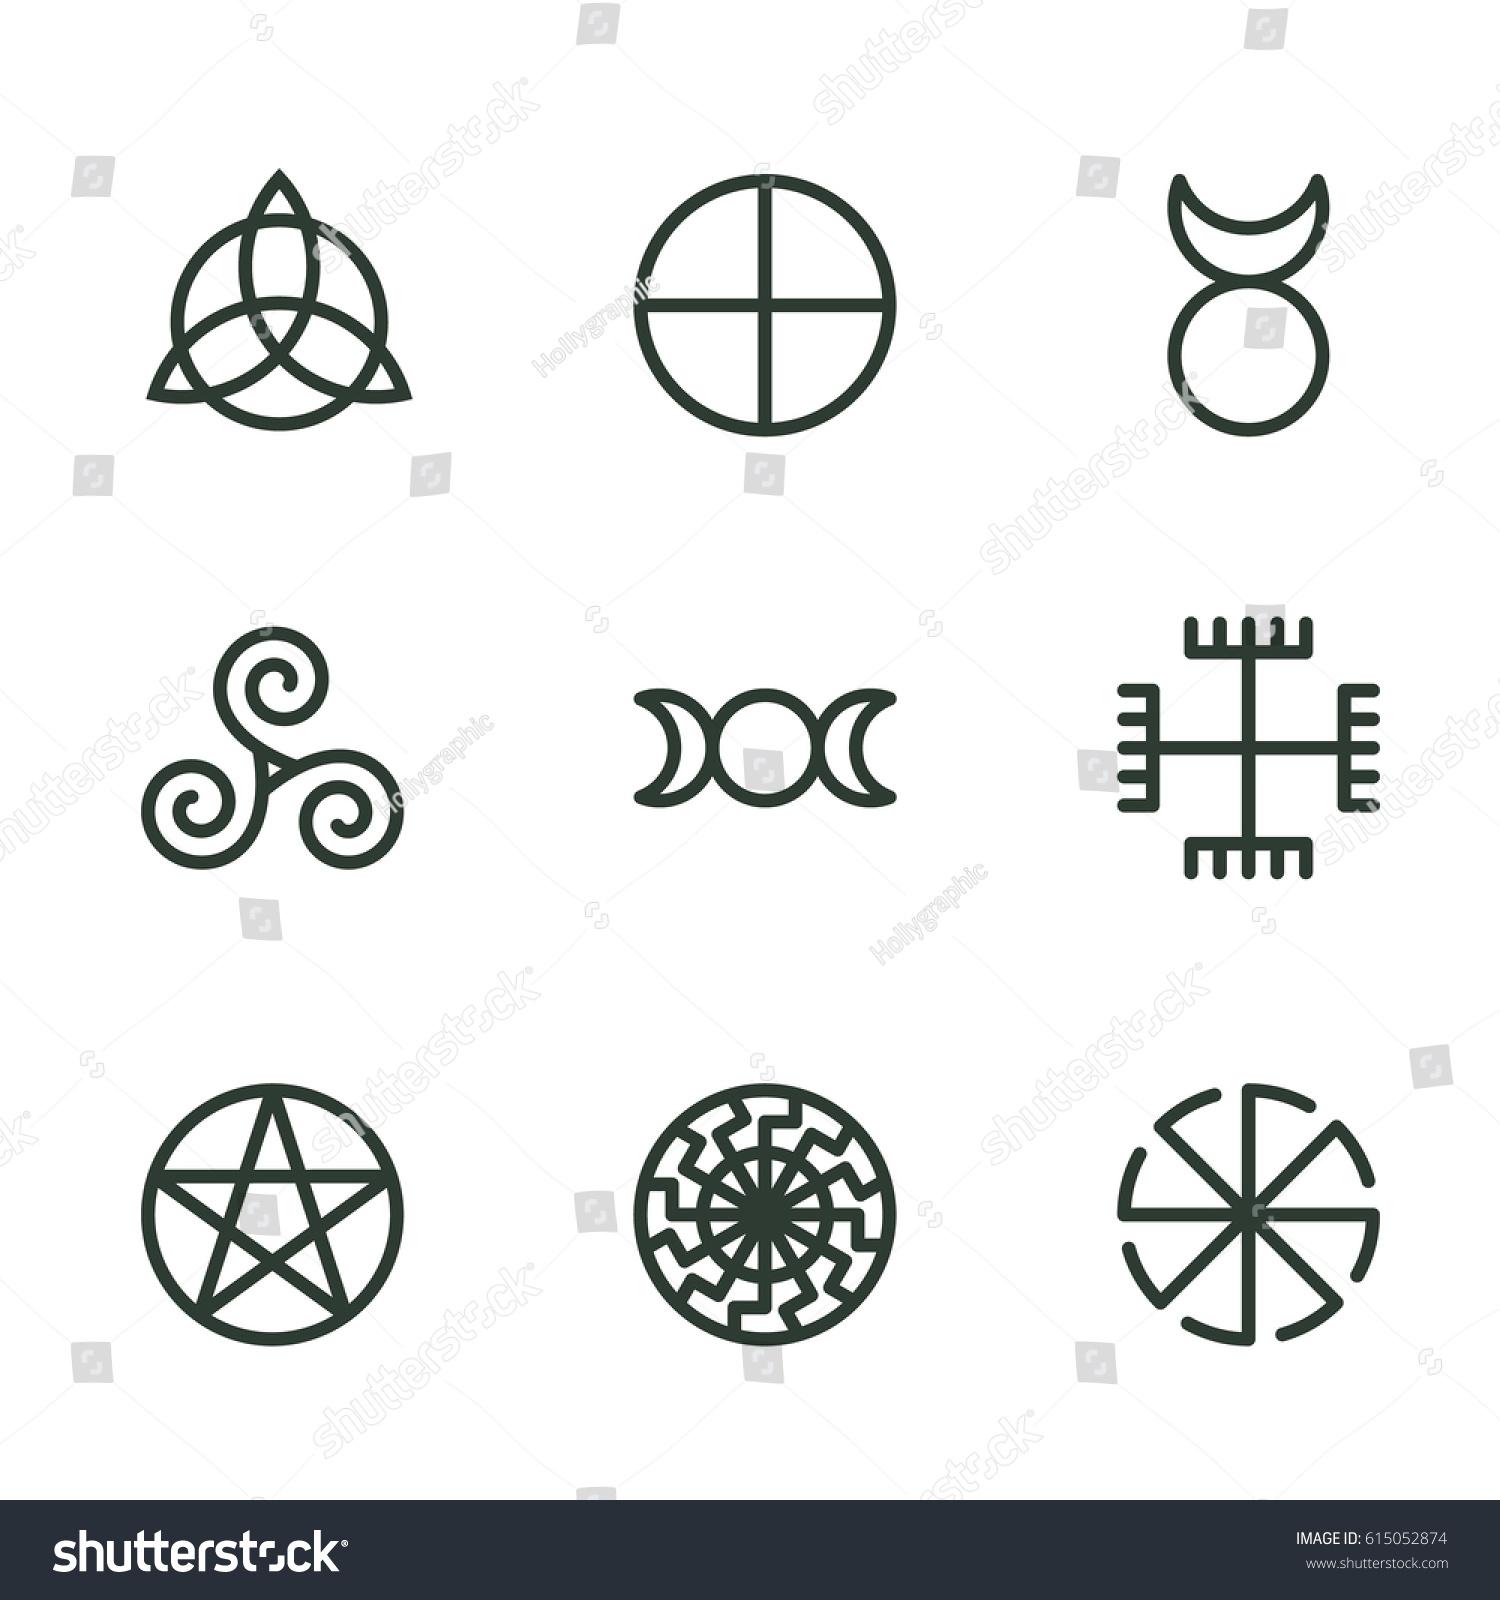 Pagan ancient symbols mystery sacred icons stock vector 615052874 pagan ancient symbols mystery sacred icons illustration vector buycottarizona Images